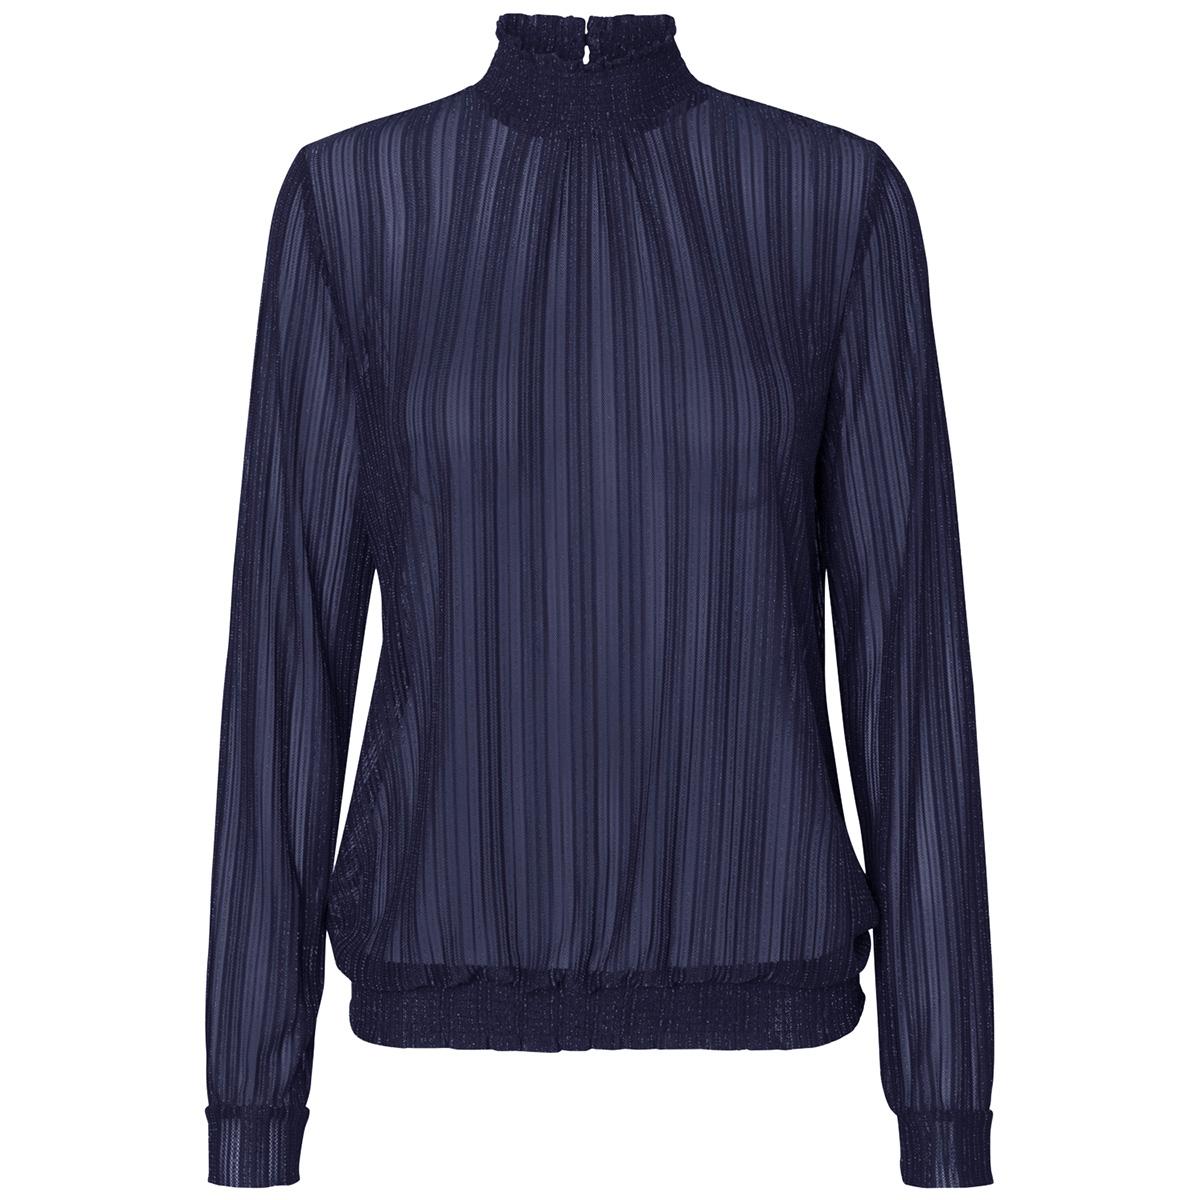 pclul ls glitter smock top camp 17095008 pieces t-shirt maritime blue/lurex silver